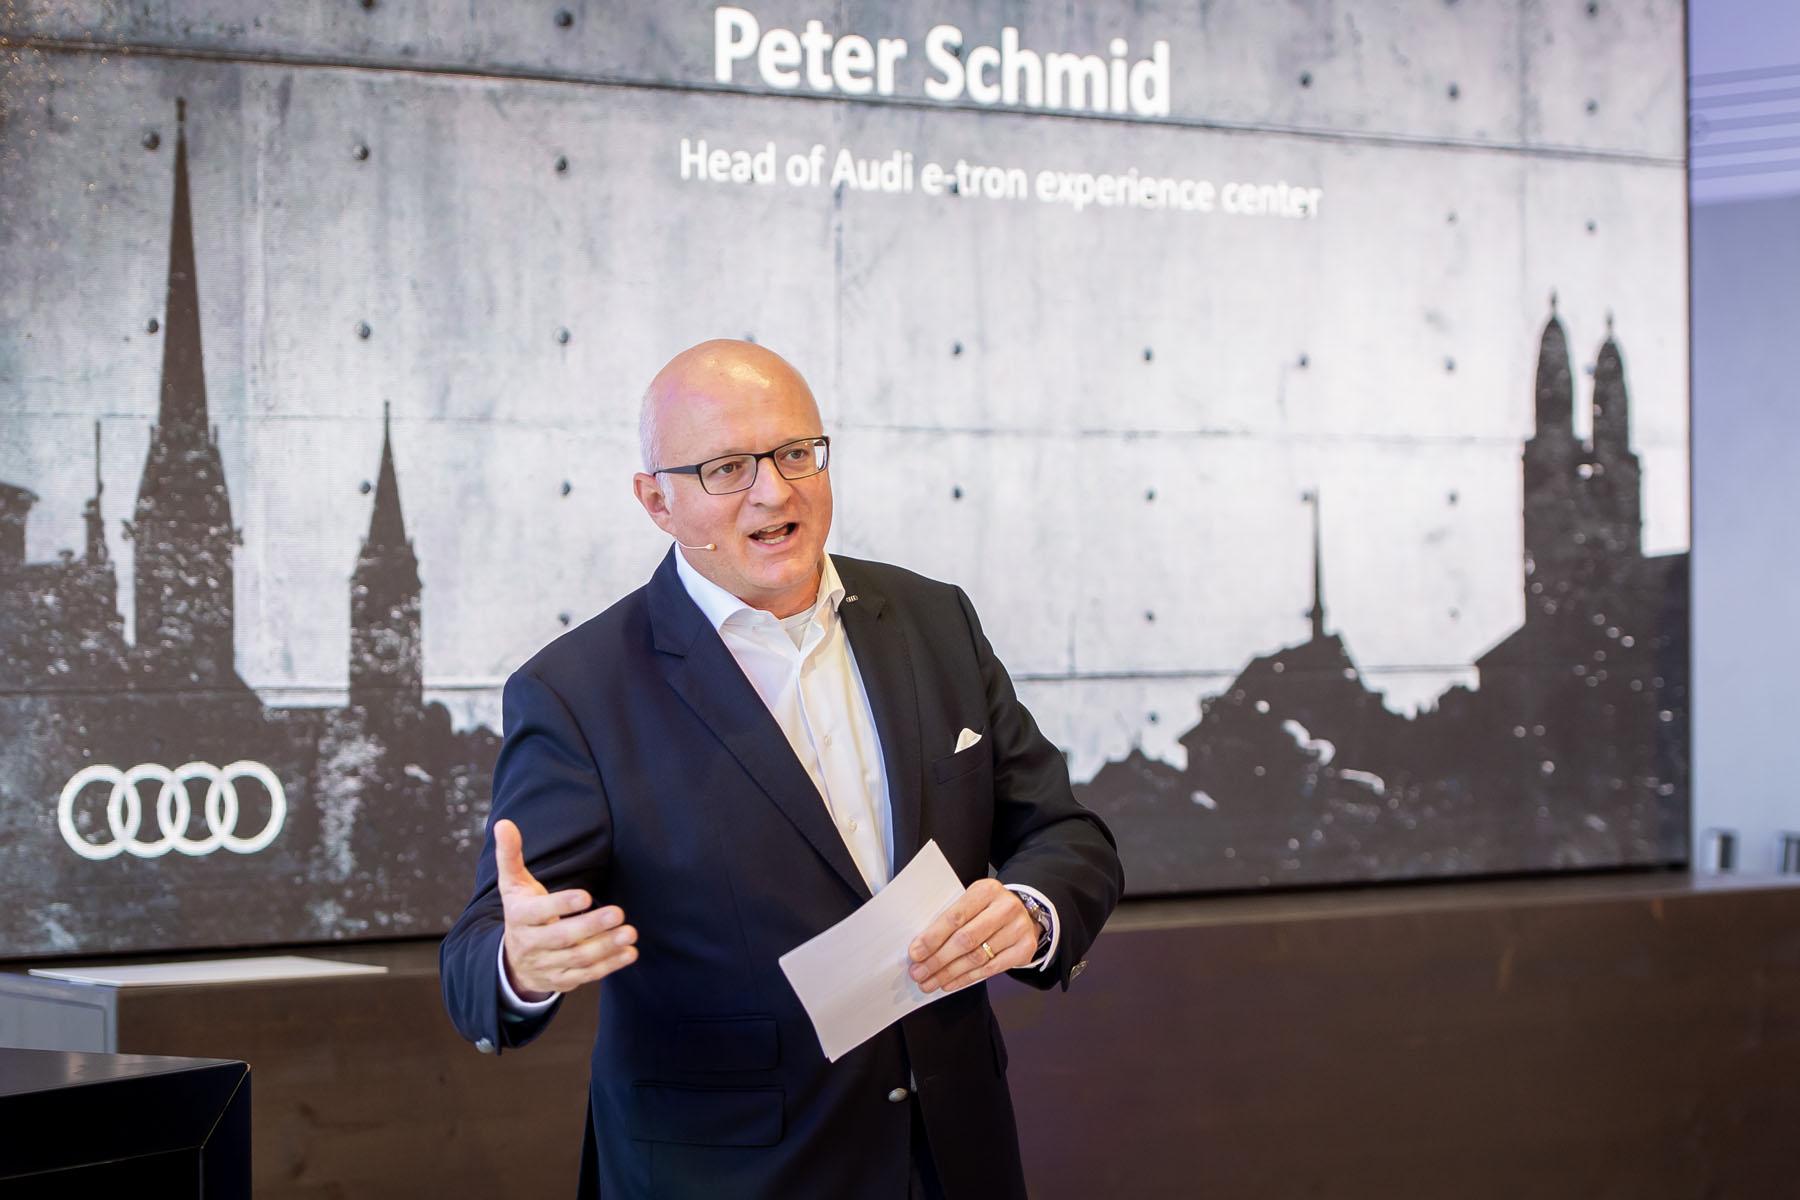 Peter Schmid leitet das e-tron experience center. (Tom Lüthi)